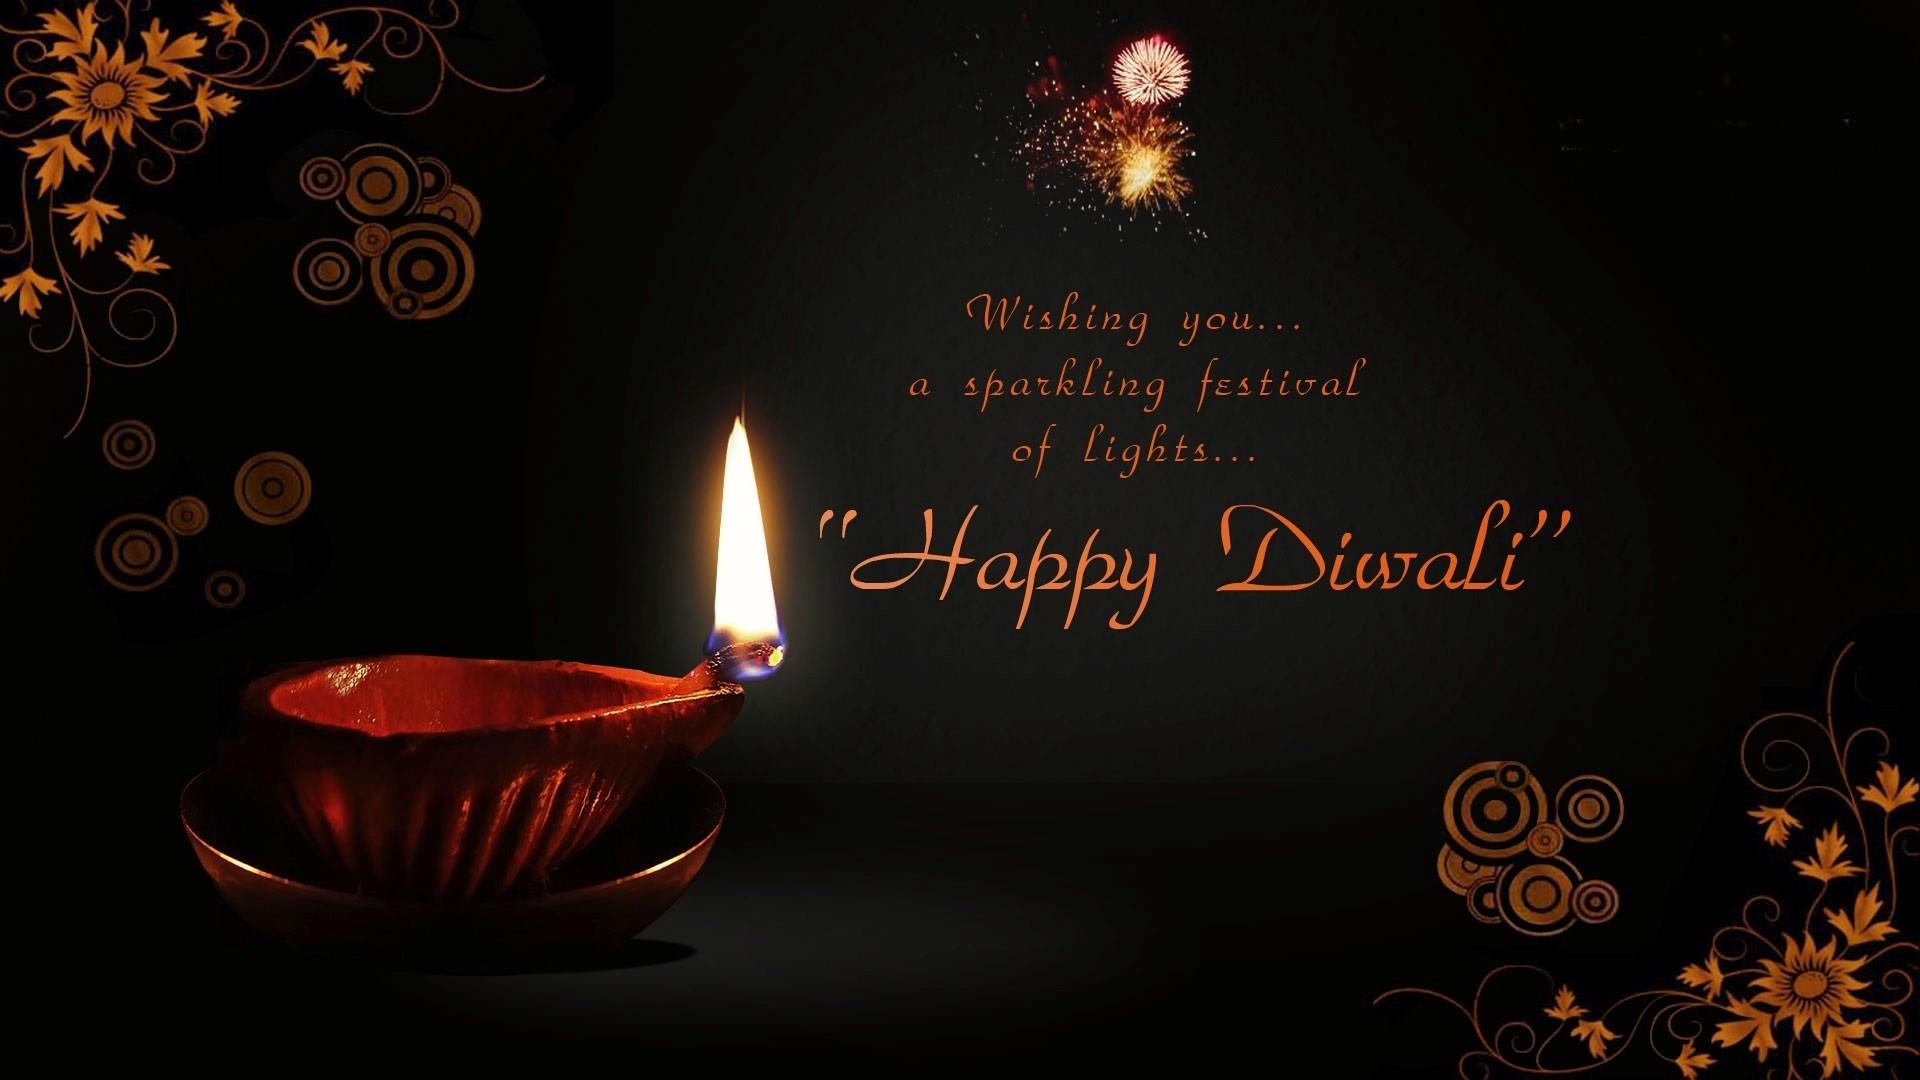 49 Hd Wallpapers Happy Diwali On Wallpapersafari